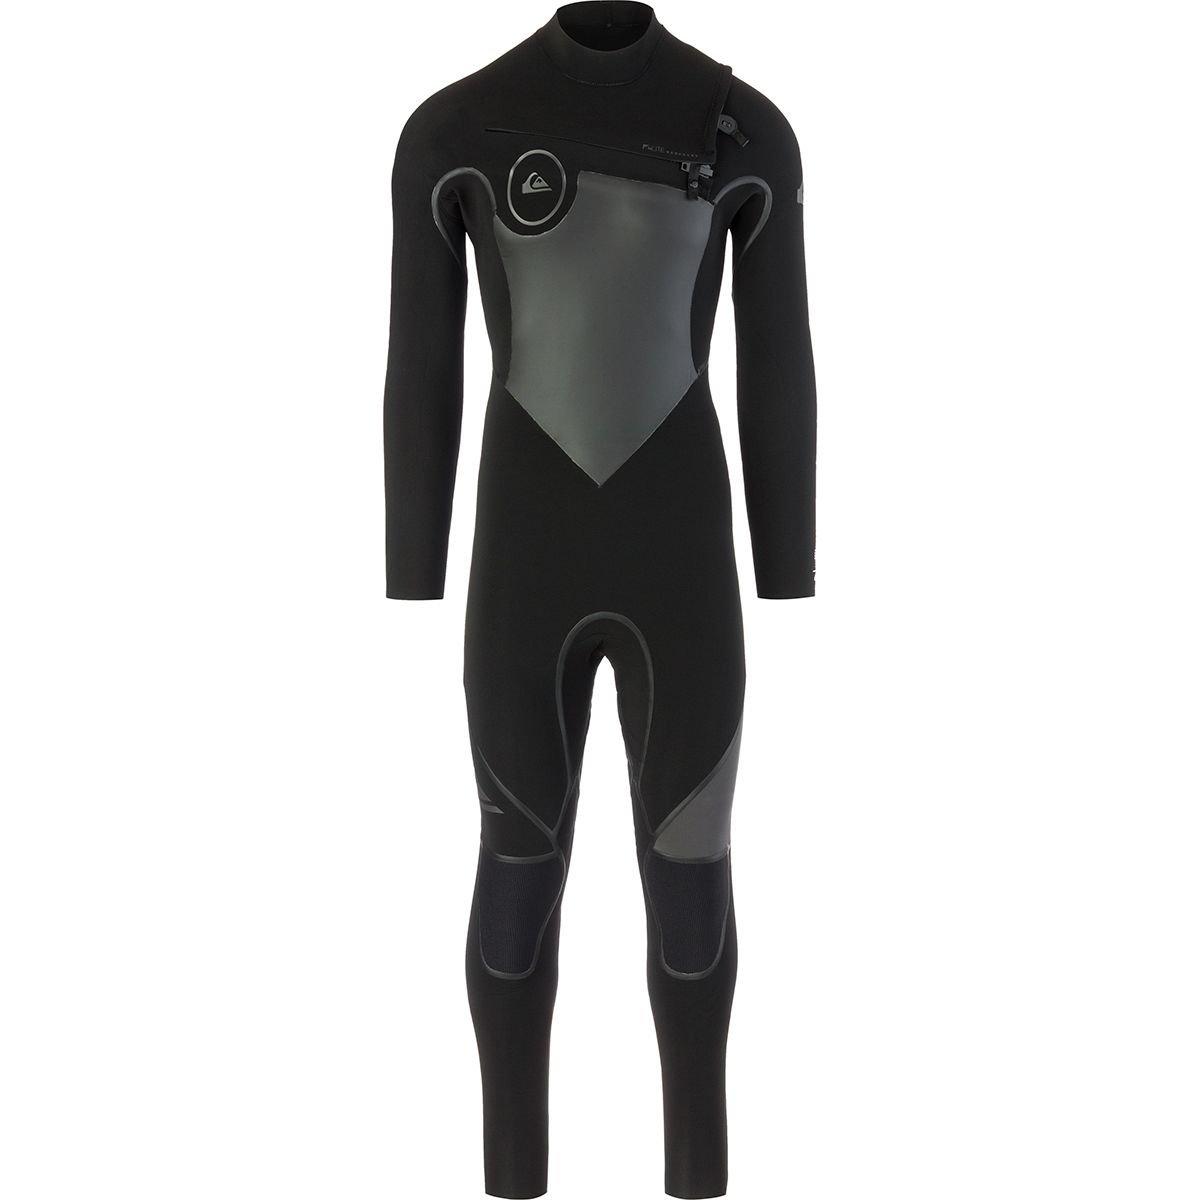 Quiksilverメンズ4 / 3 mm Syncro Plus Chest Zip – Full Wetsuit Chest Zipウェットスーツ B071YB7SQB Black/ Black/ Jet Black Large Large|Black/ Black/ Jet Black